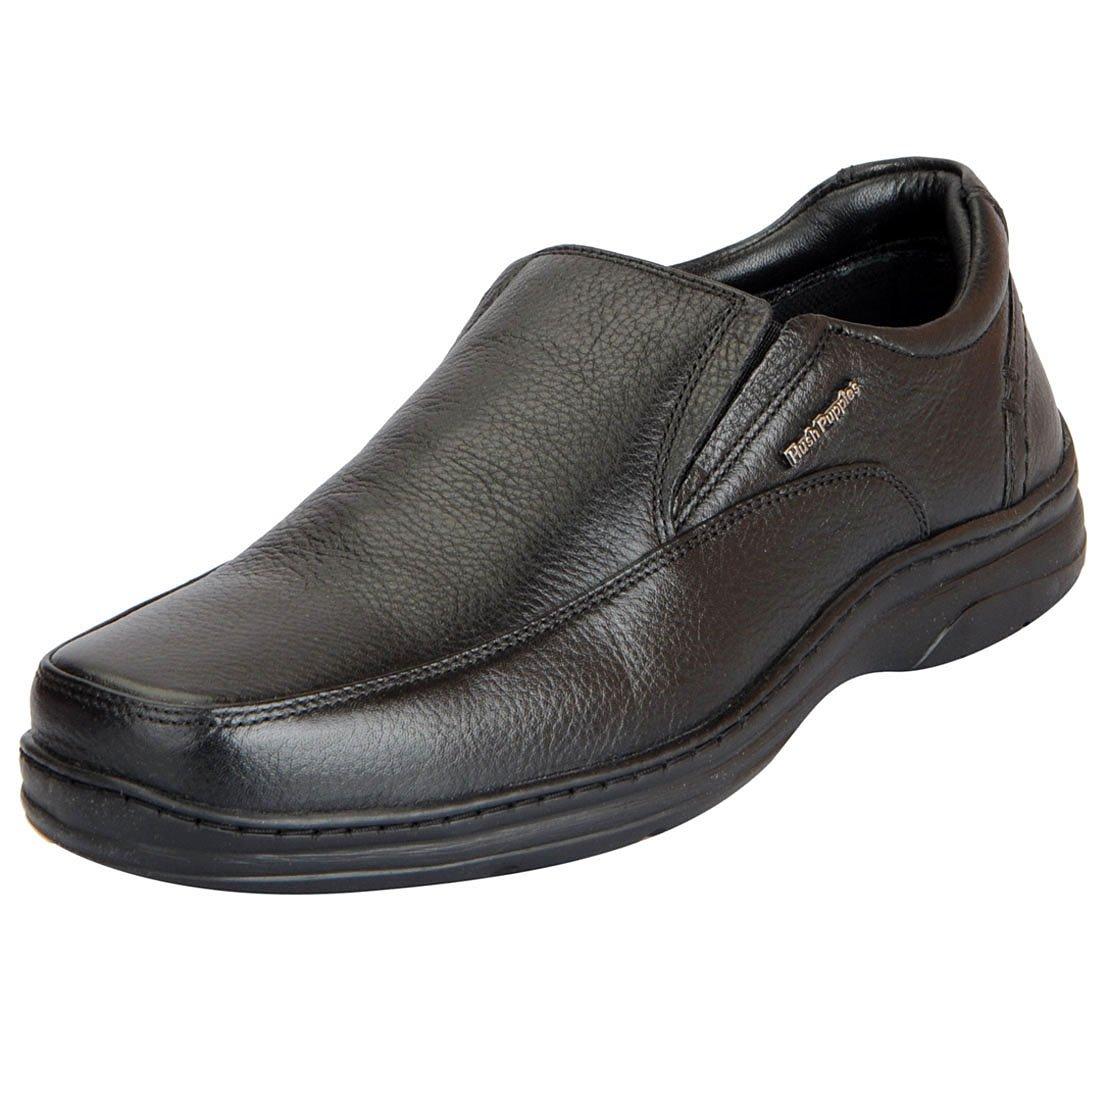 hush puppies shoes online sale